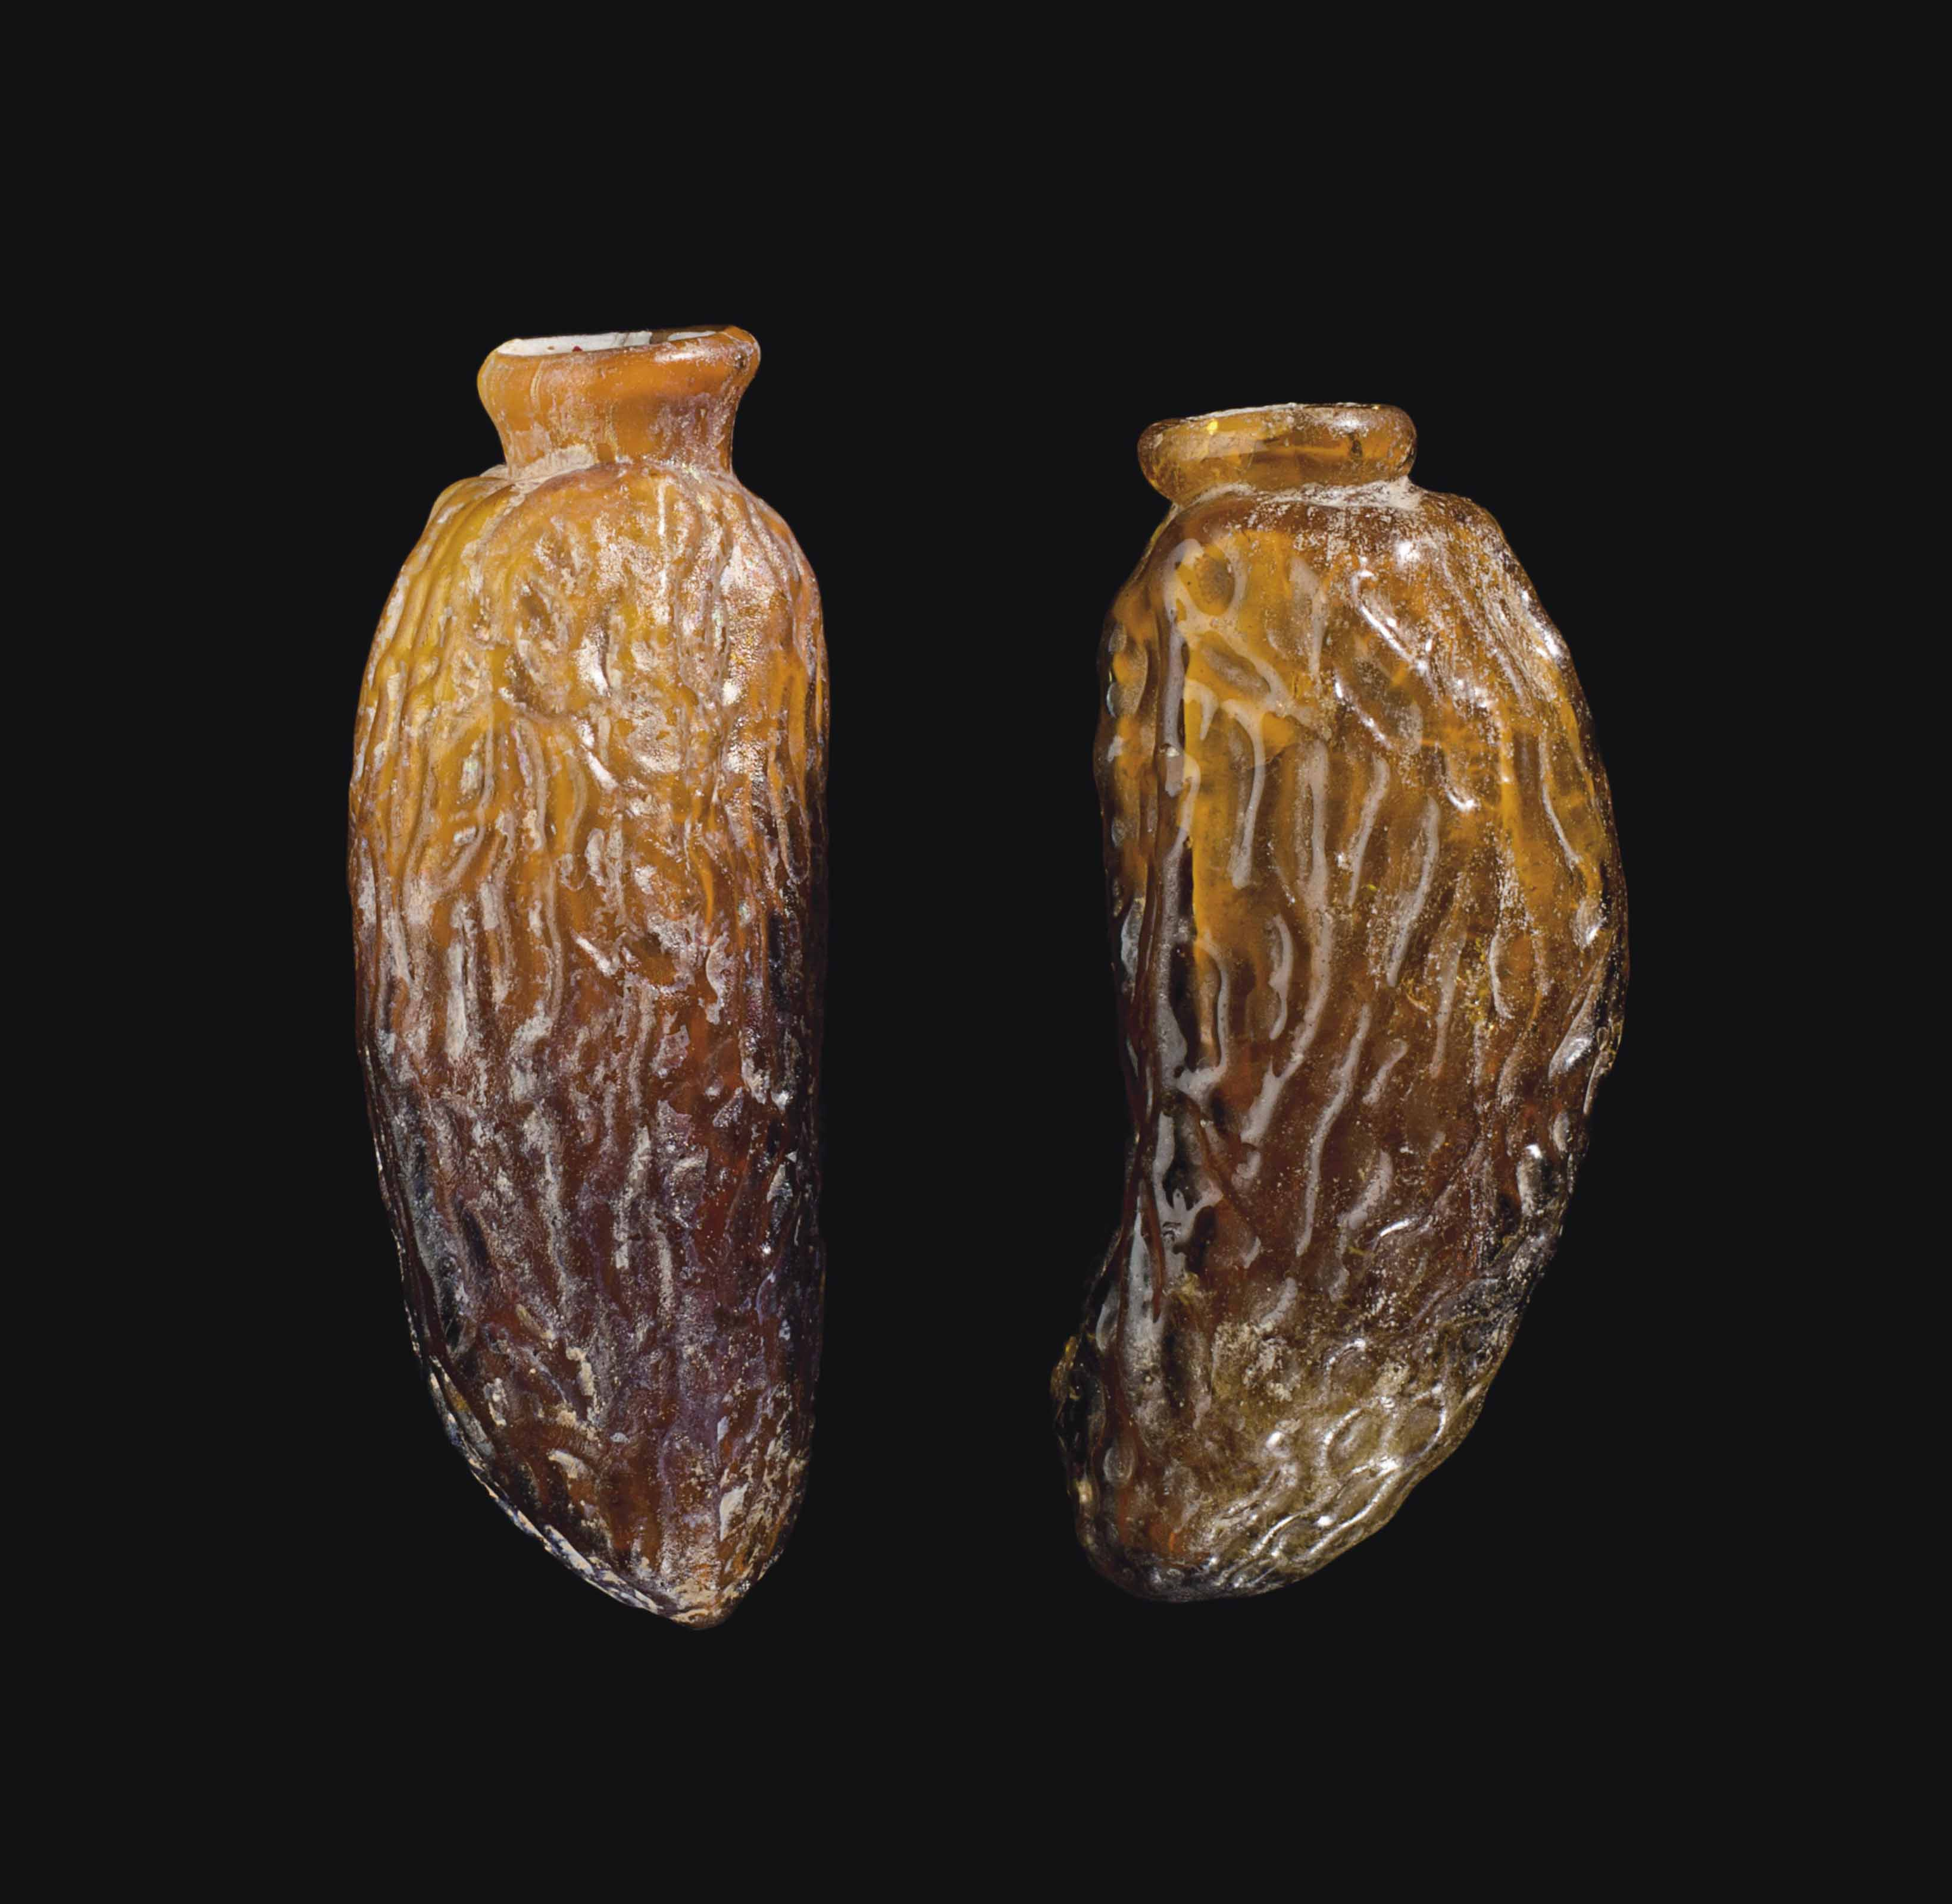 TWO ROMAN GLASS DATE FLASKS